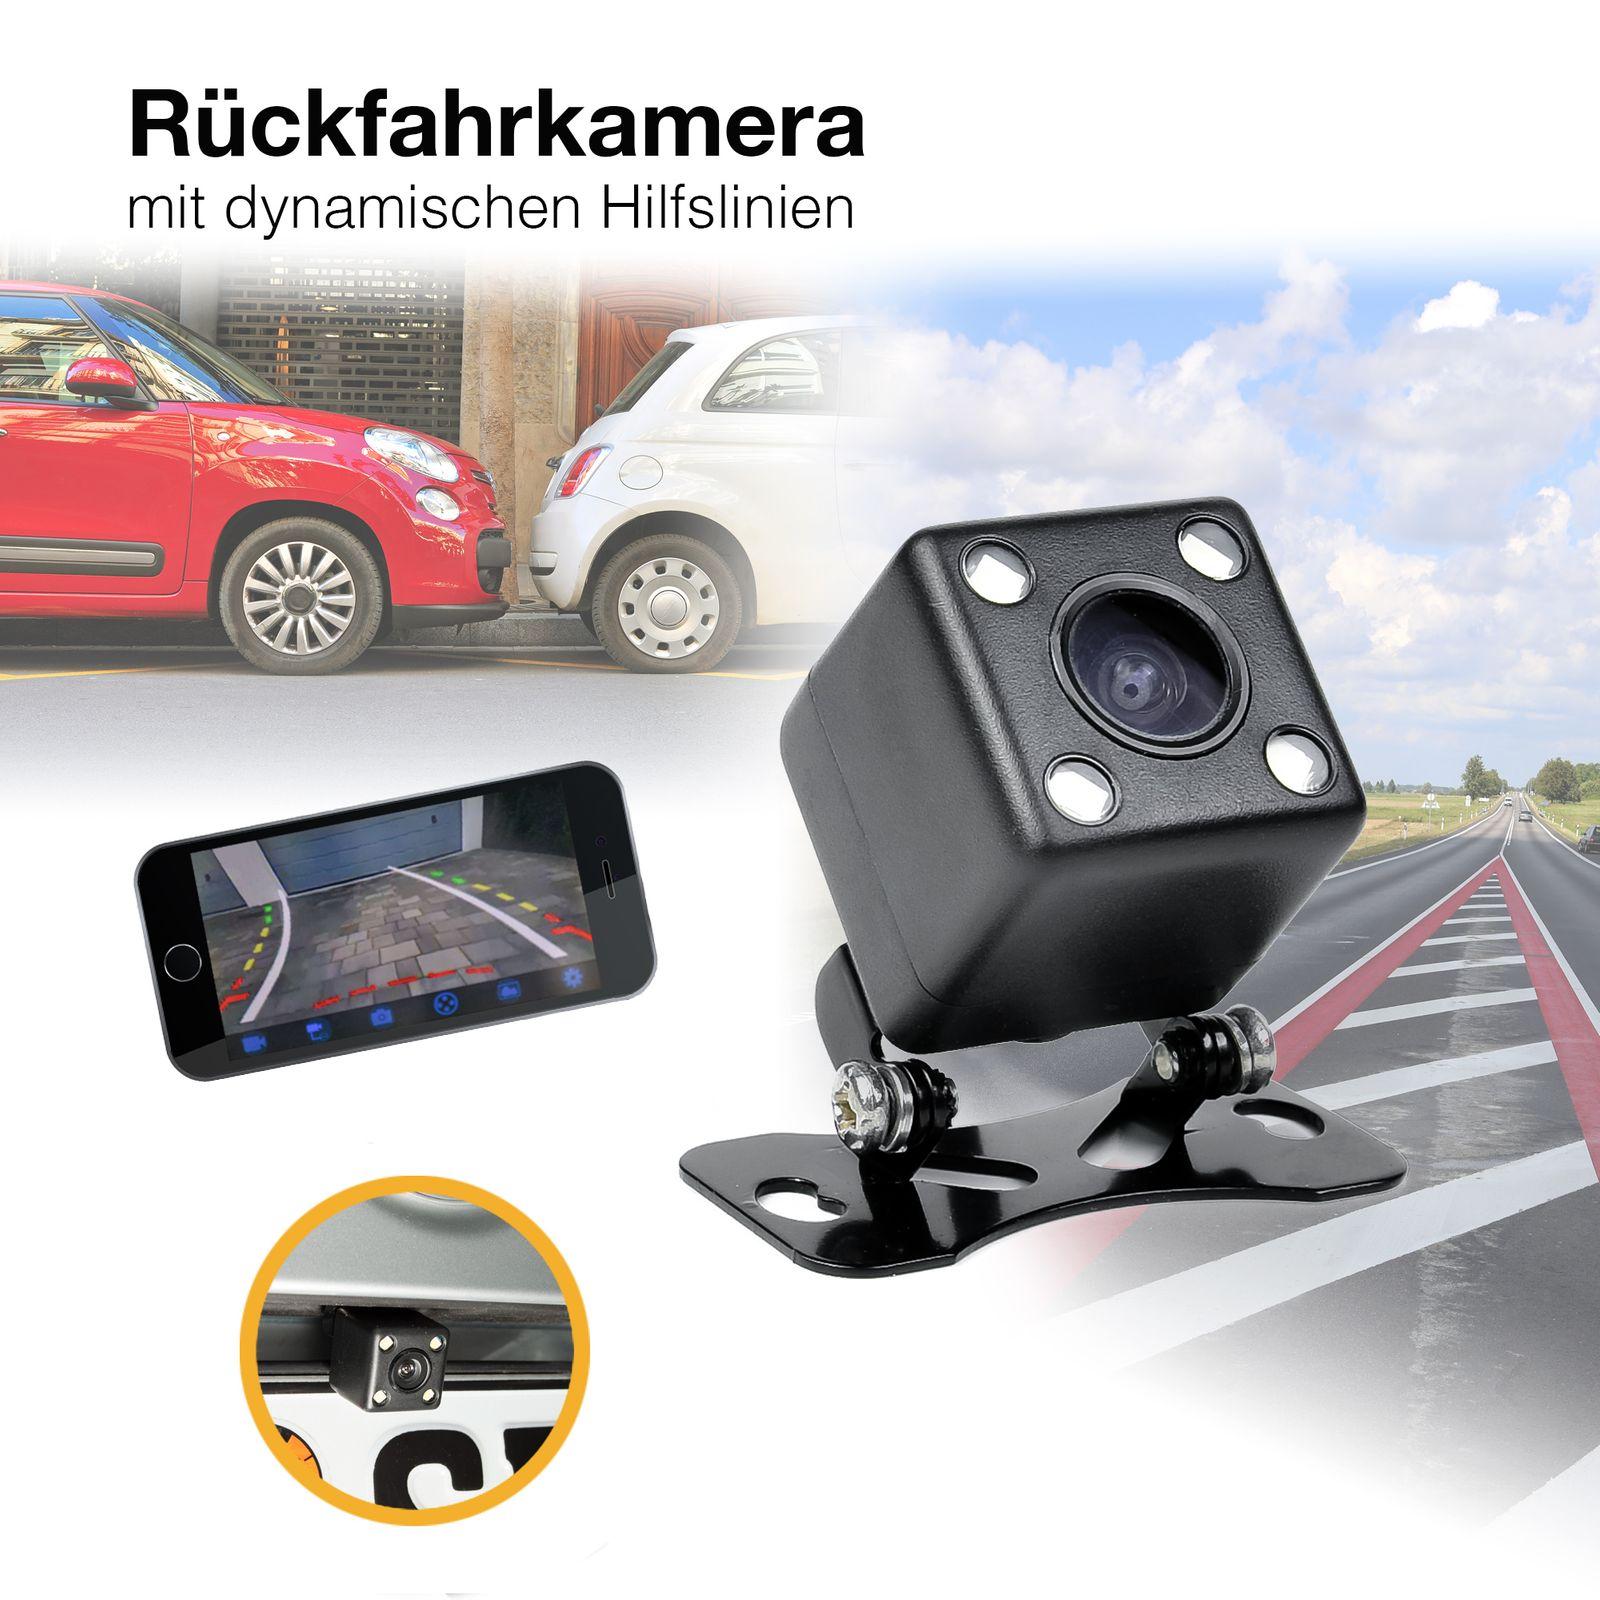 Auto Mini HD Rückfahrkamera Unterbau 170° Grad PAL mit dynamische Parklinien Hilfslinien 520TVL